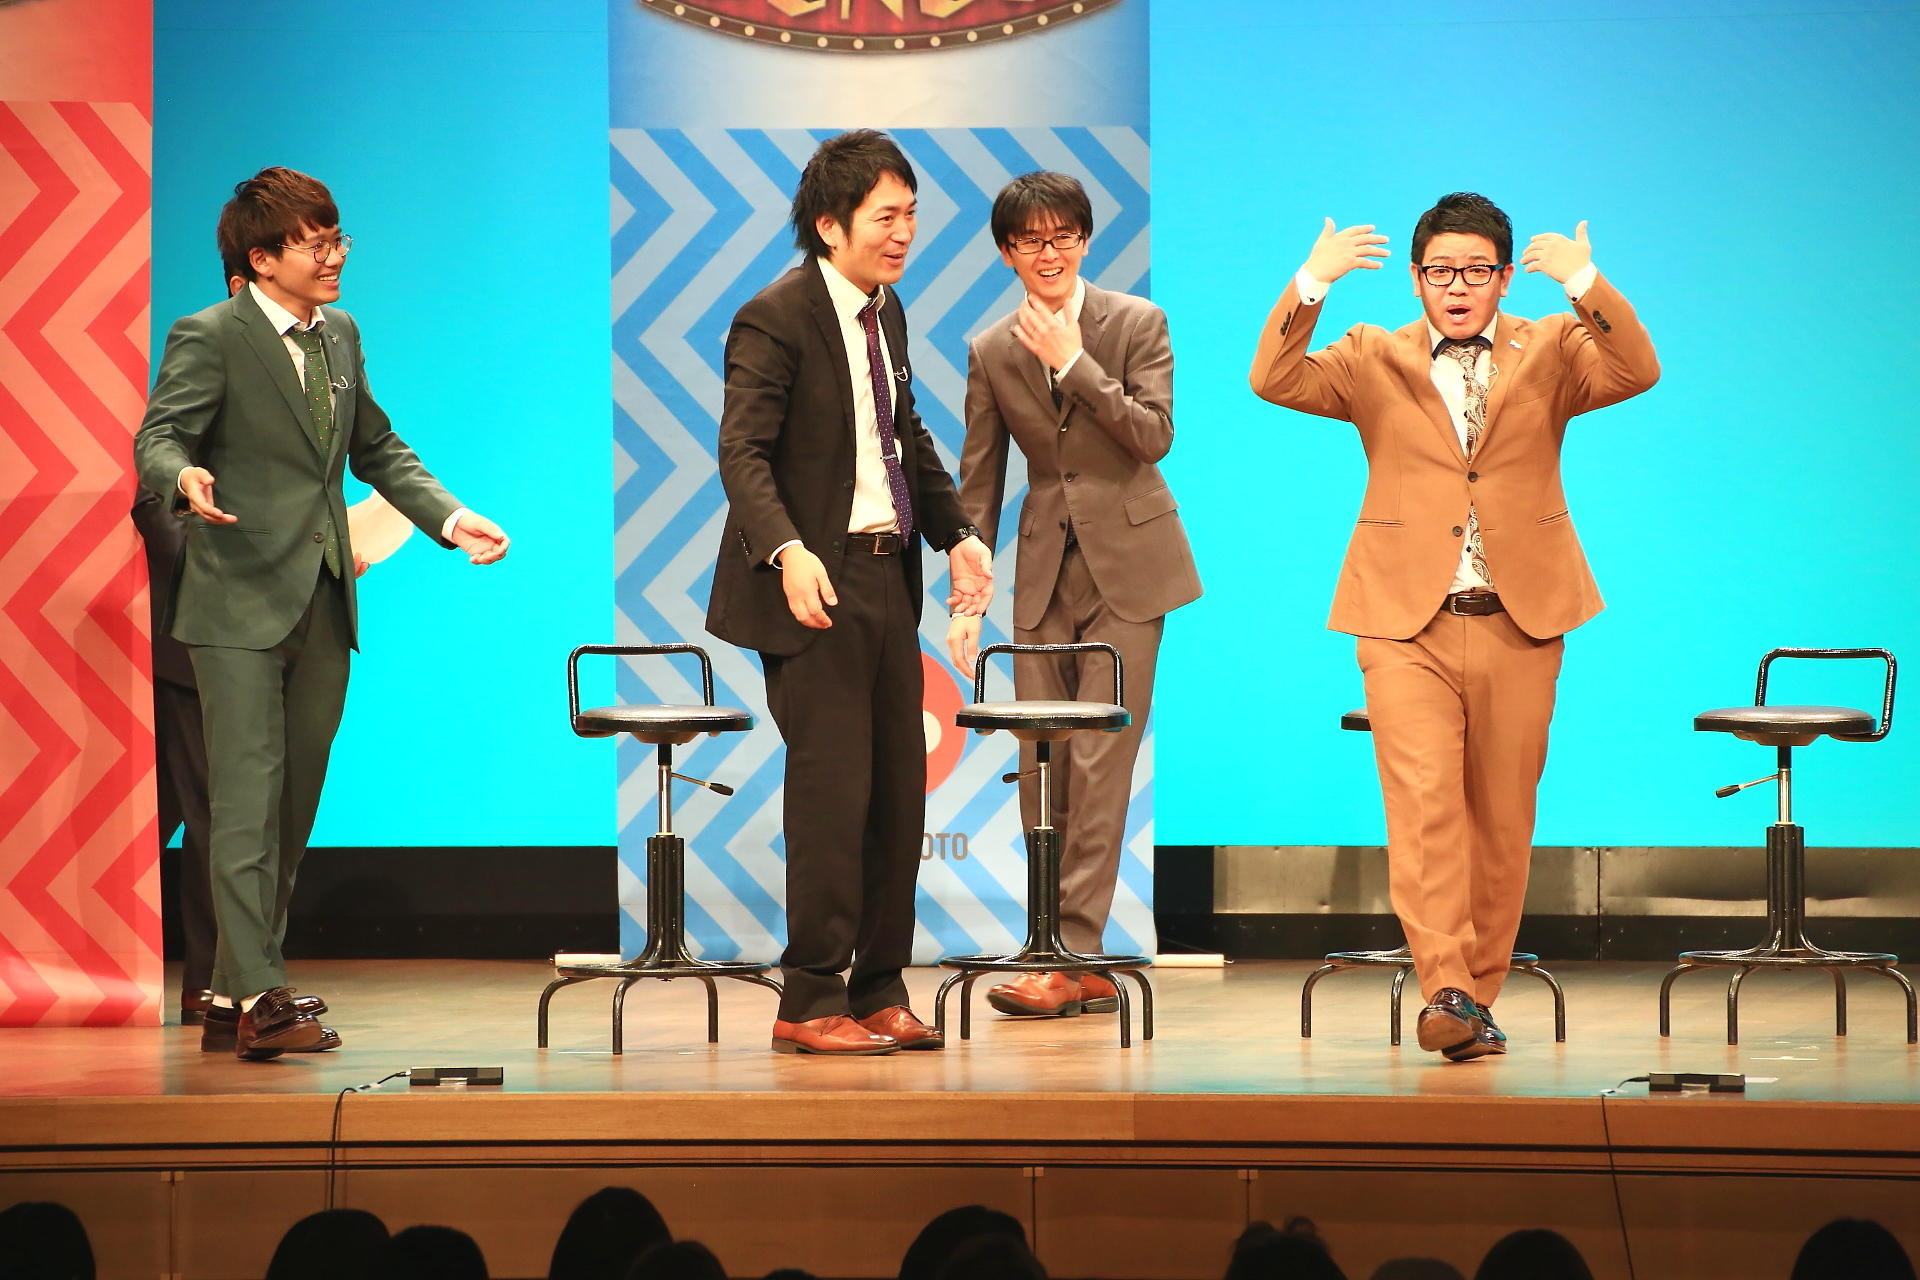 http://news.yoshimoto.co.jp/20171112095237-1da0ce2ed1622ab2cec23ead51d6b3ccfb0318f6.jpg